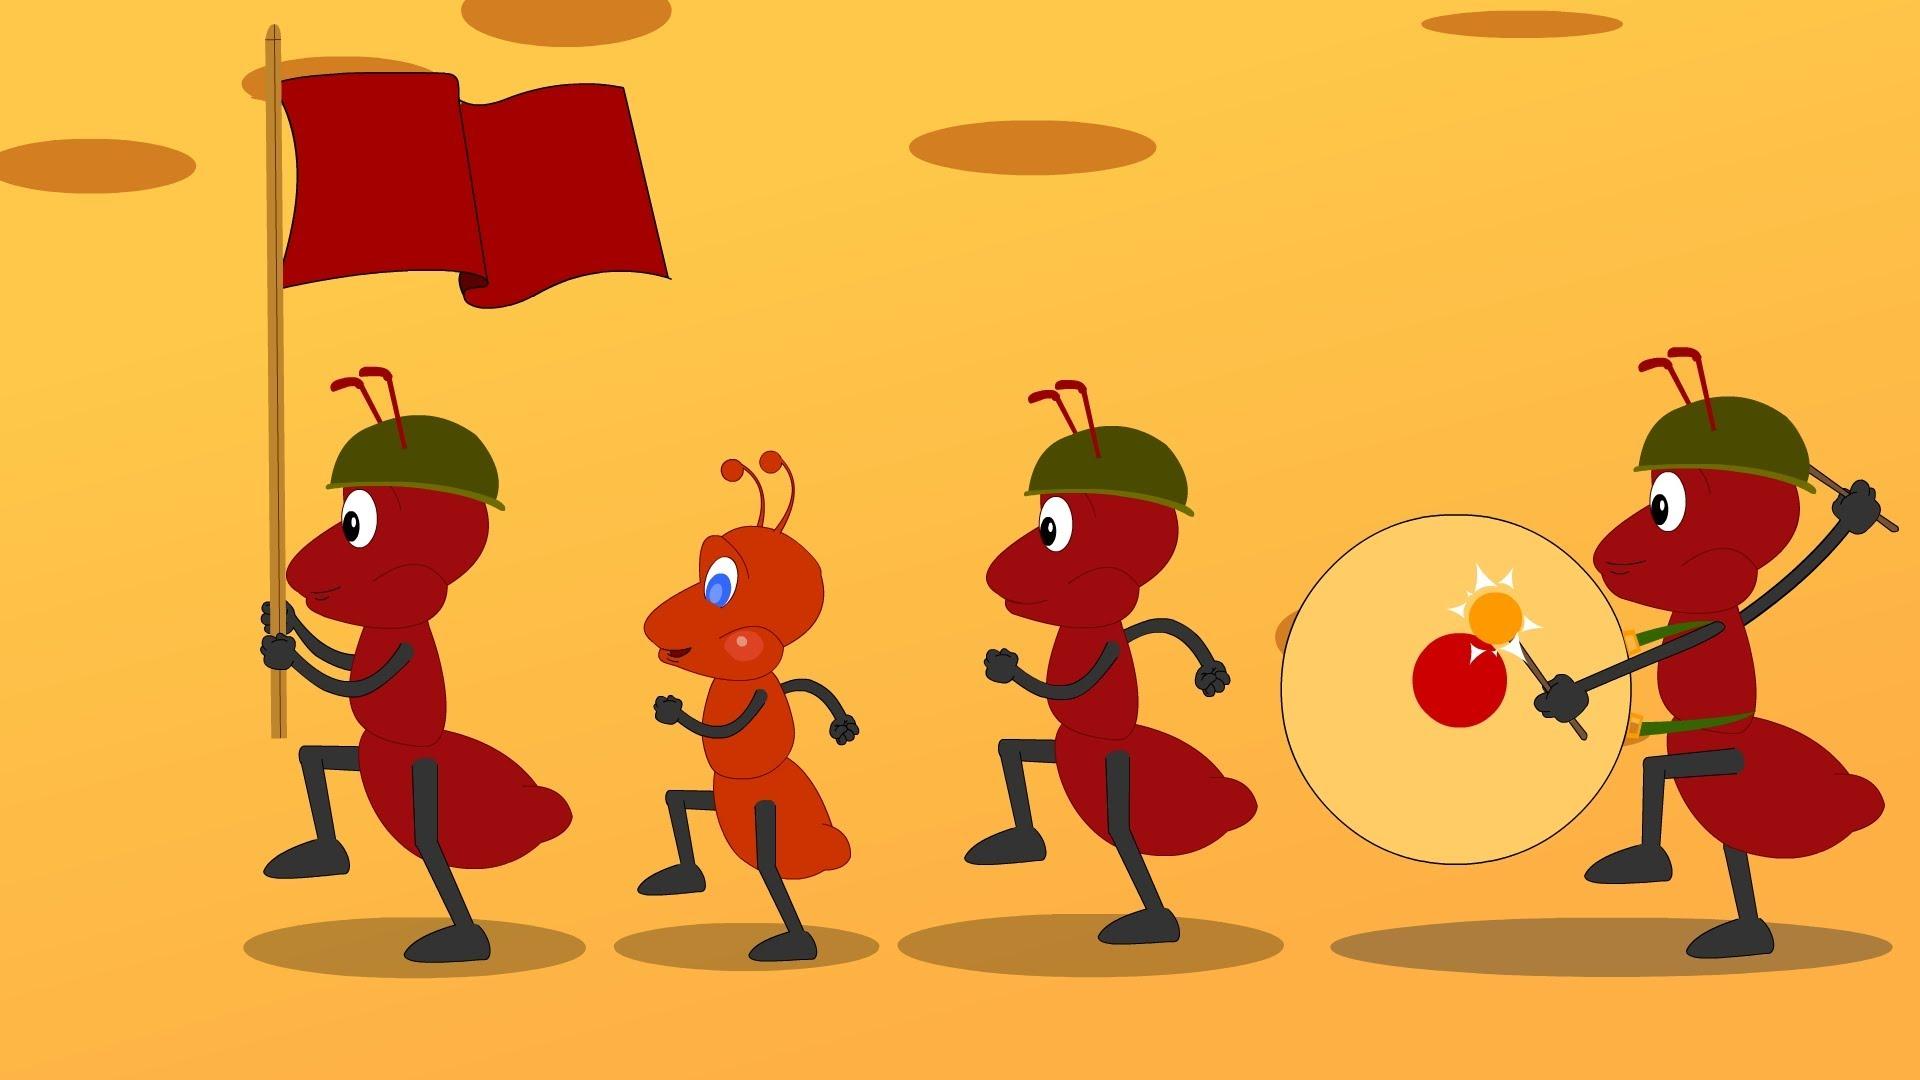 Kako se znebiti mravelj v hiši?